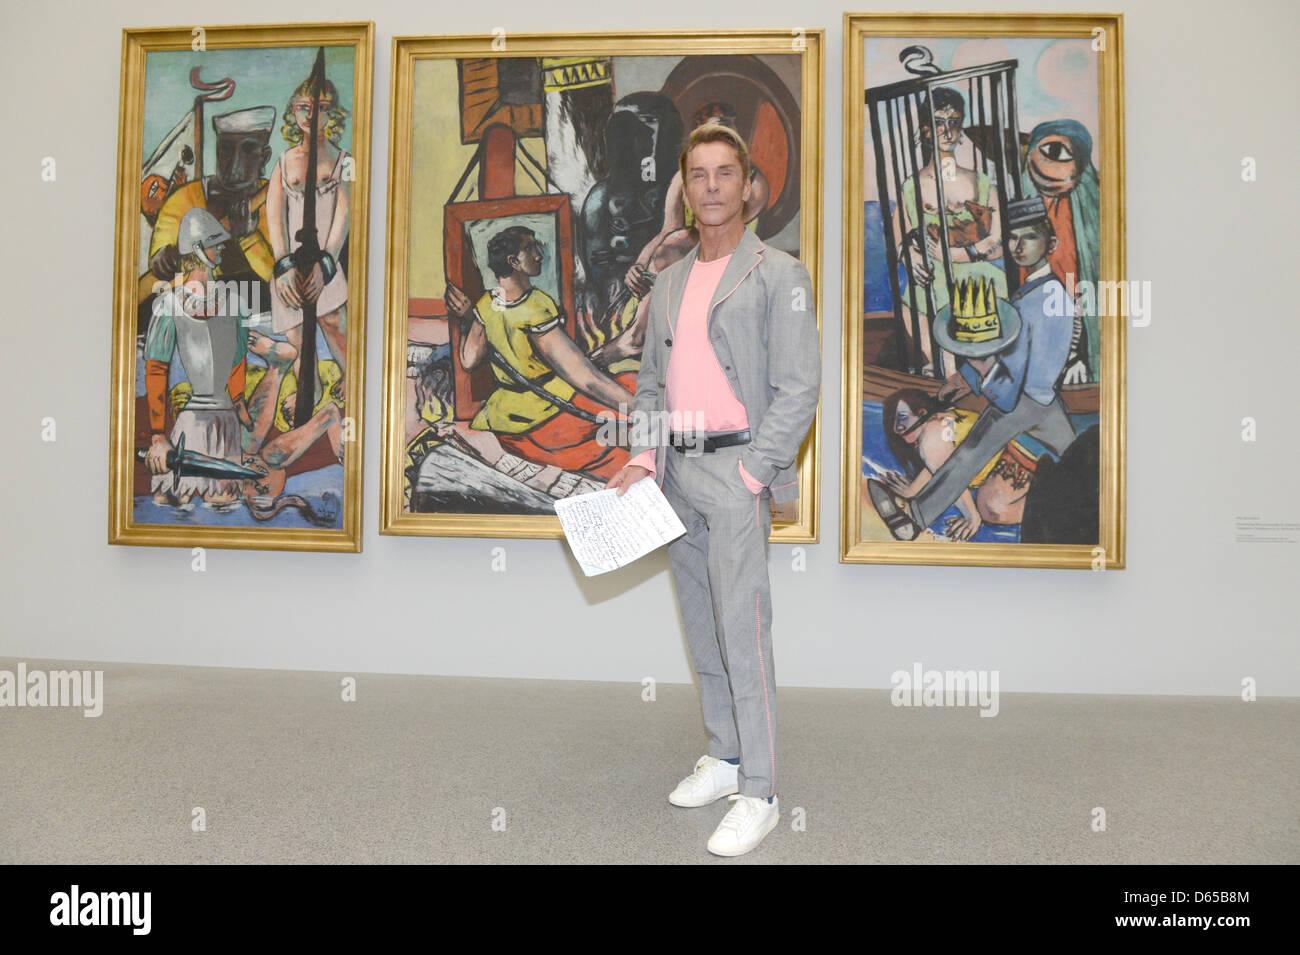 Fashion designer allemand Wolfgang Joop pose devant la tentation de peinture (la tentation de saint Antoine) de Photo Stock